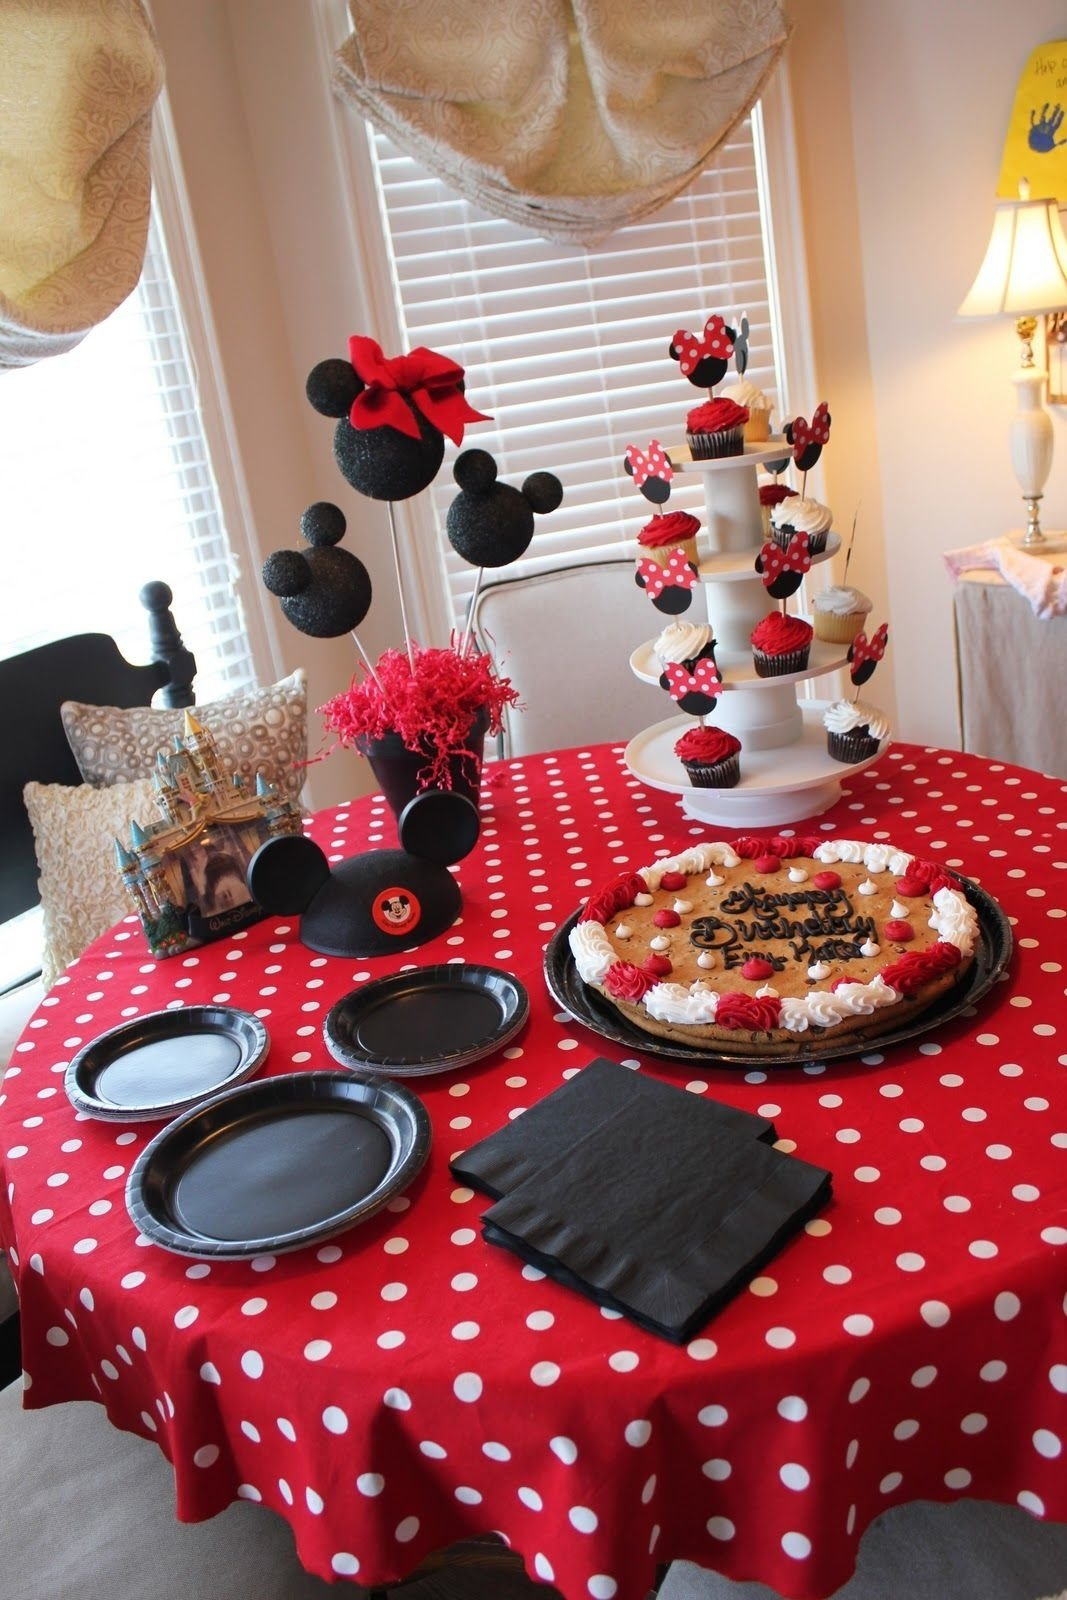 10 Lovely Mickey Mouse Party Ideas Pinterest mickey mouse party cupcakes and decor i love it party ideas 2020